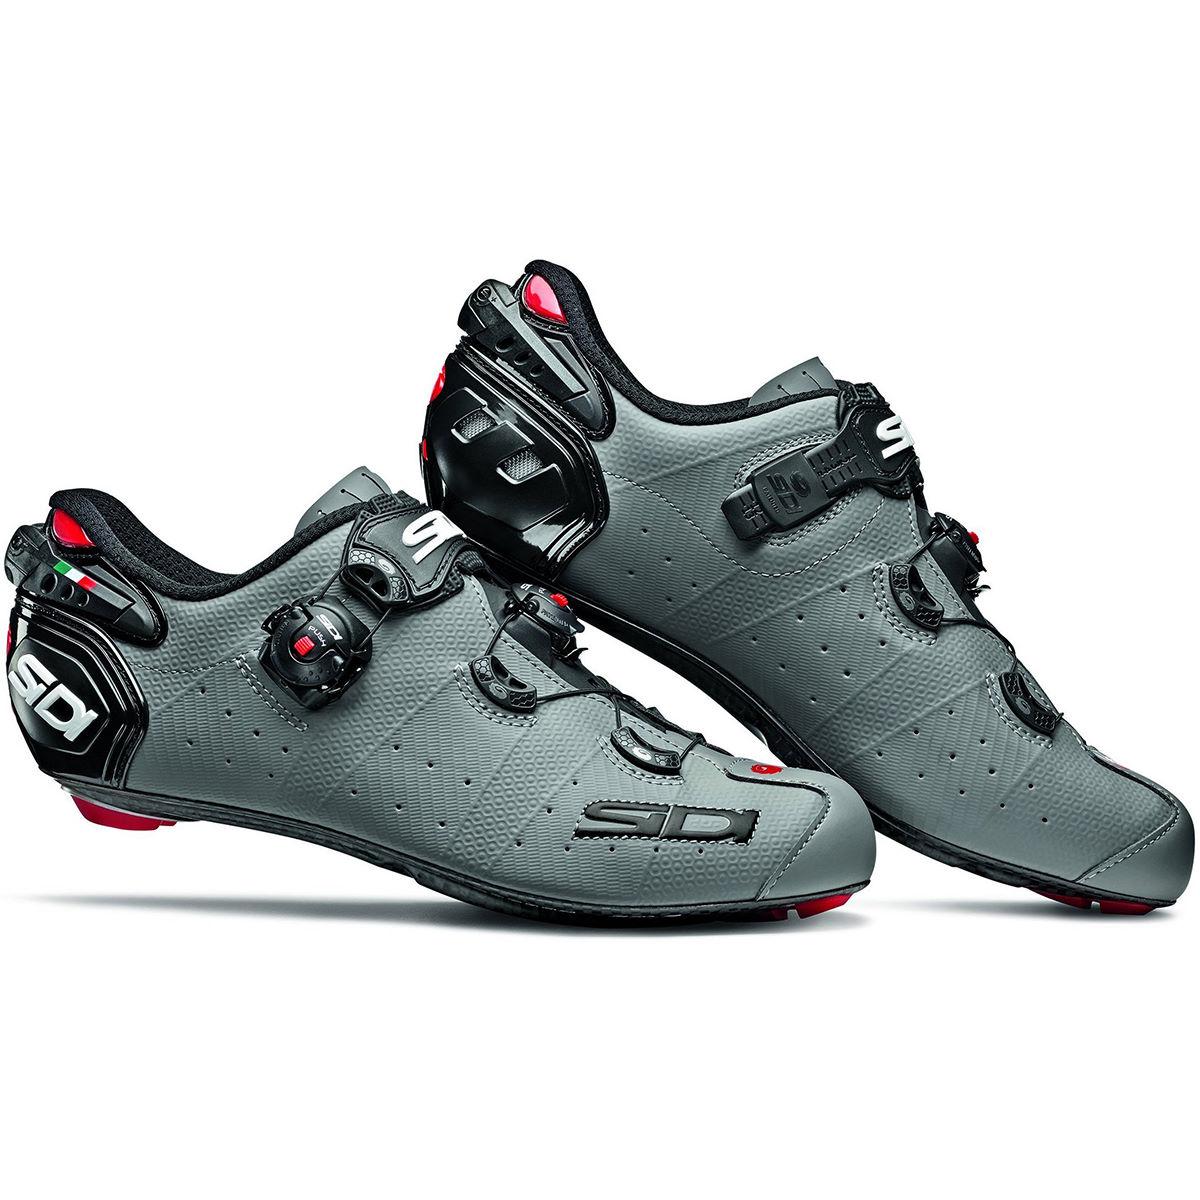 Sidi Wire 2 Matt Carbon Road Cycling Shoe